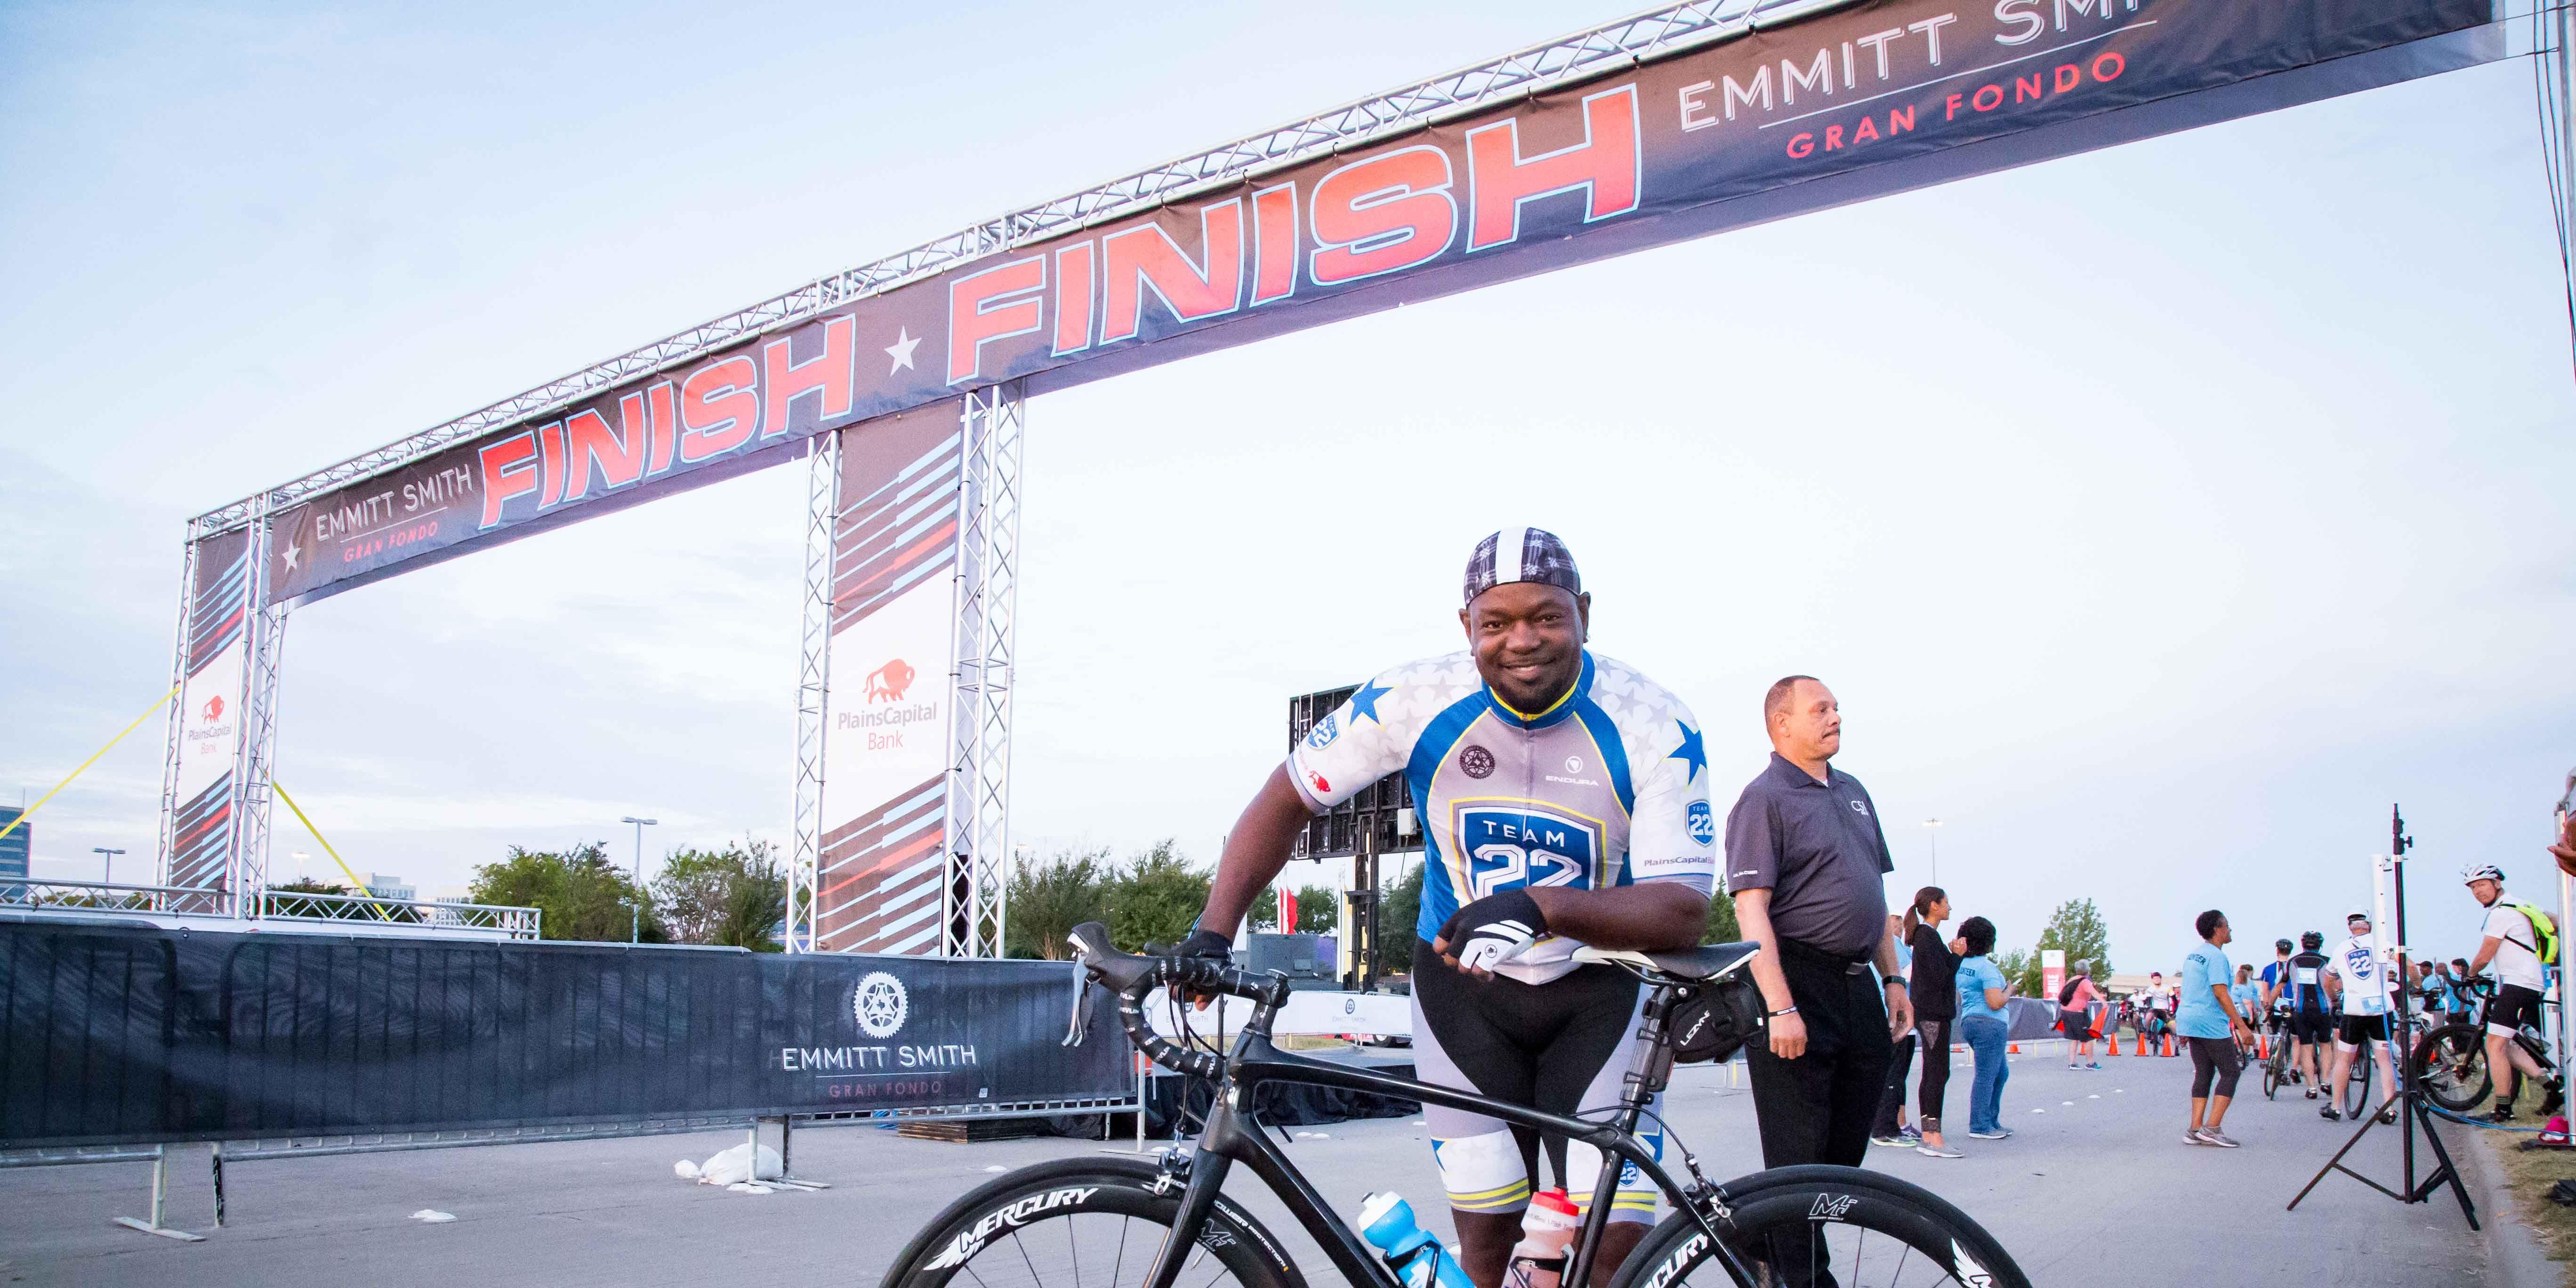 Emmitt Smith cycling